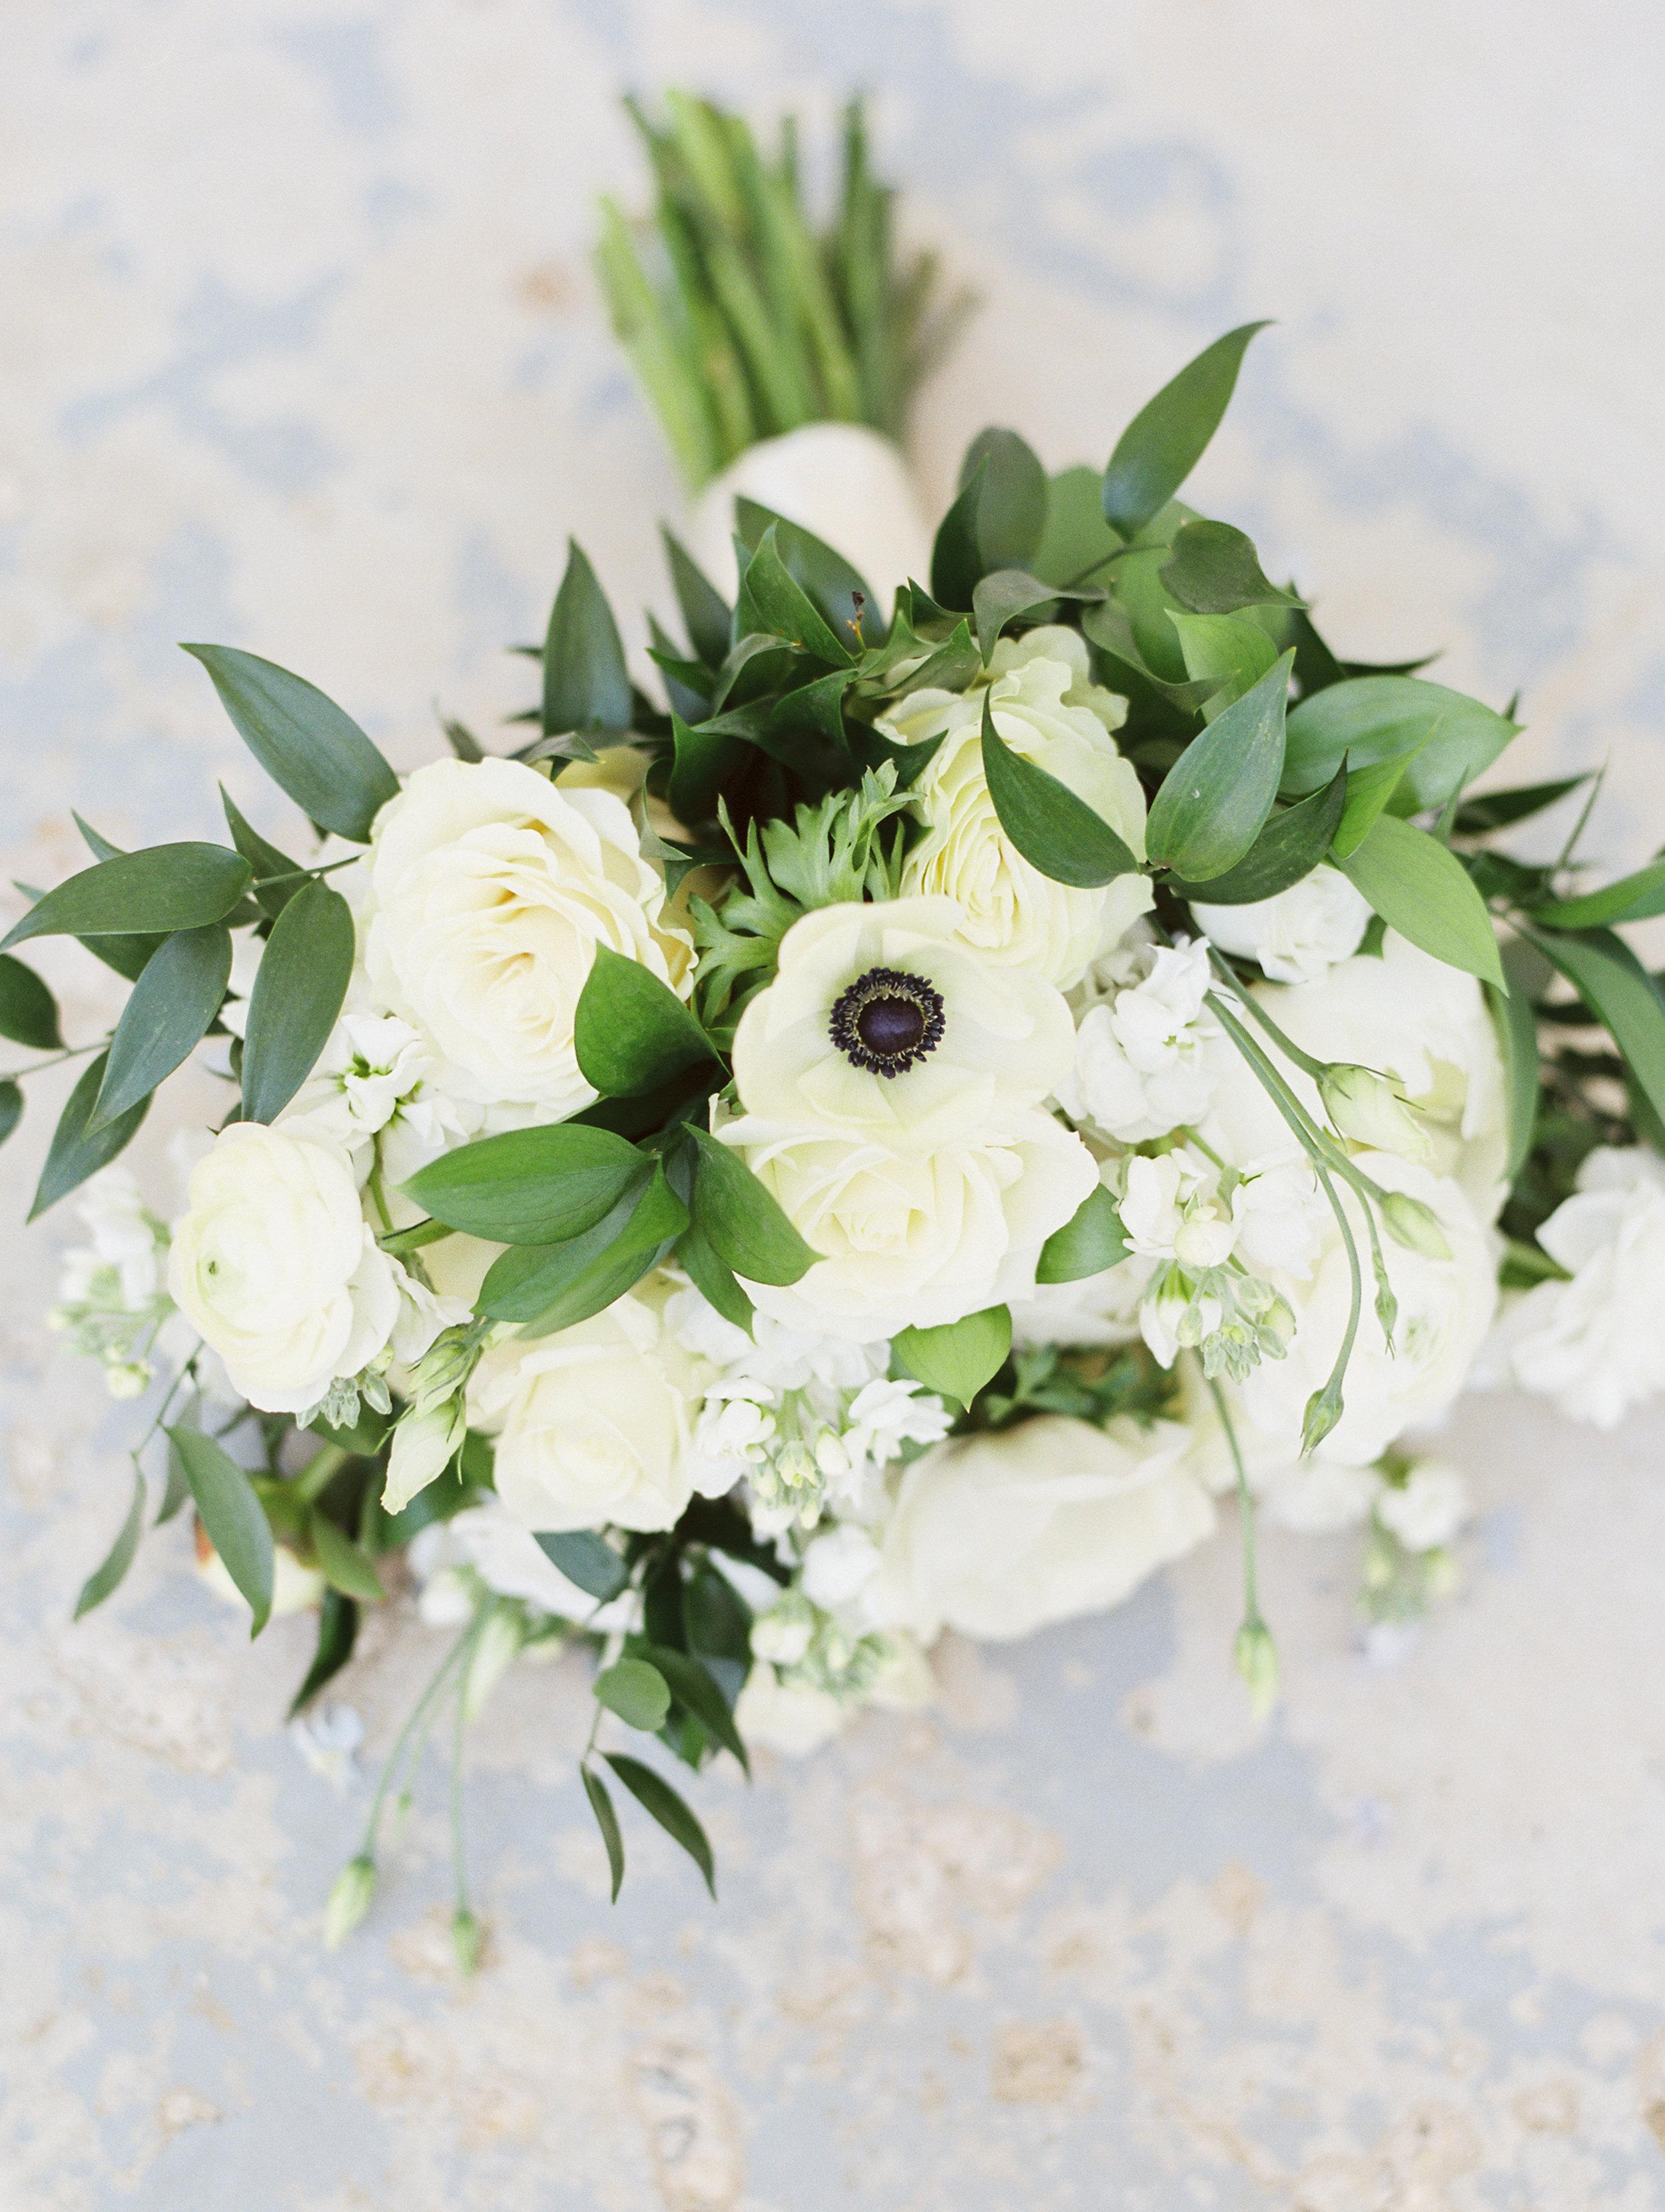 DeGuilio+Wedding+Detailsf-24 copy.jpg